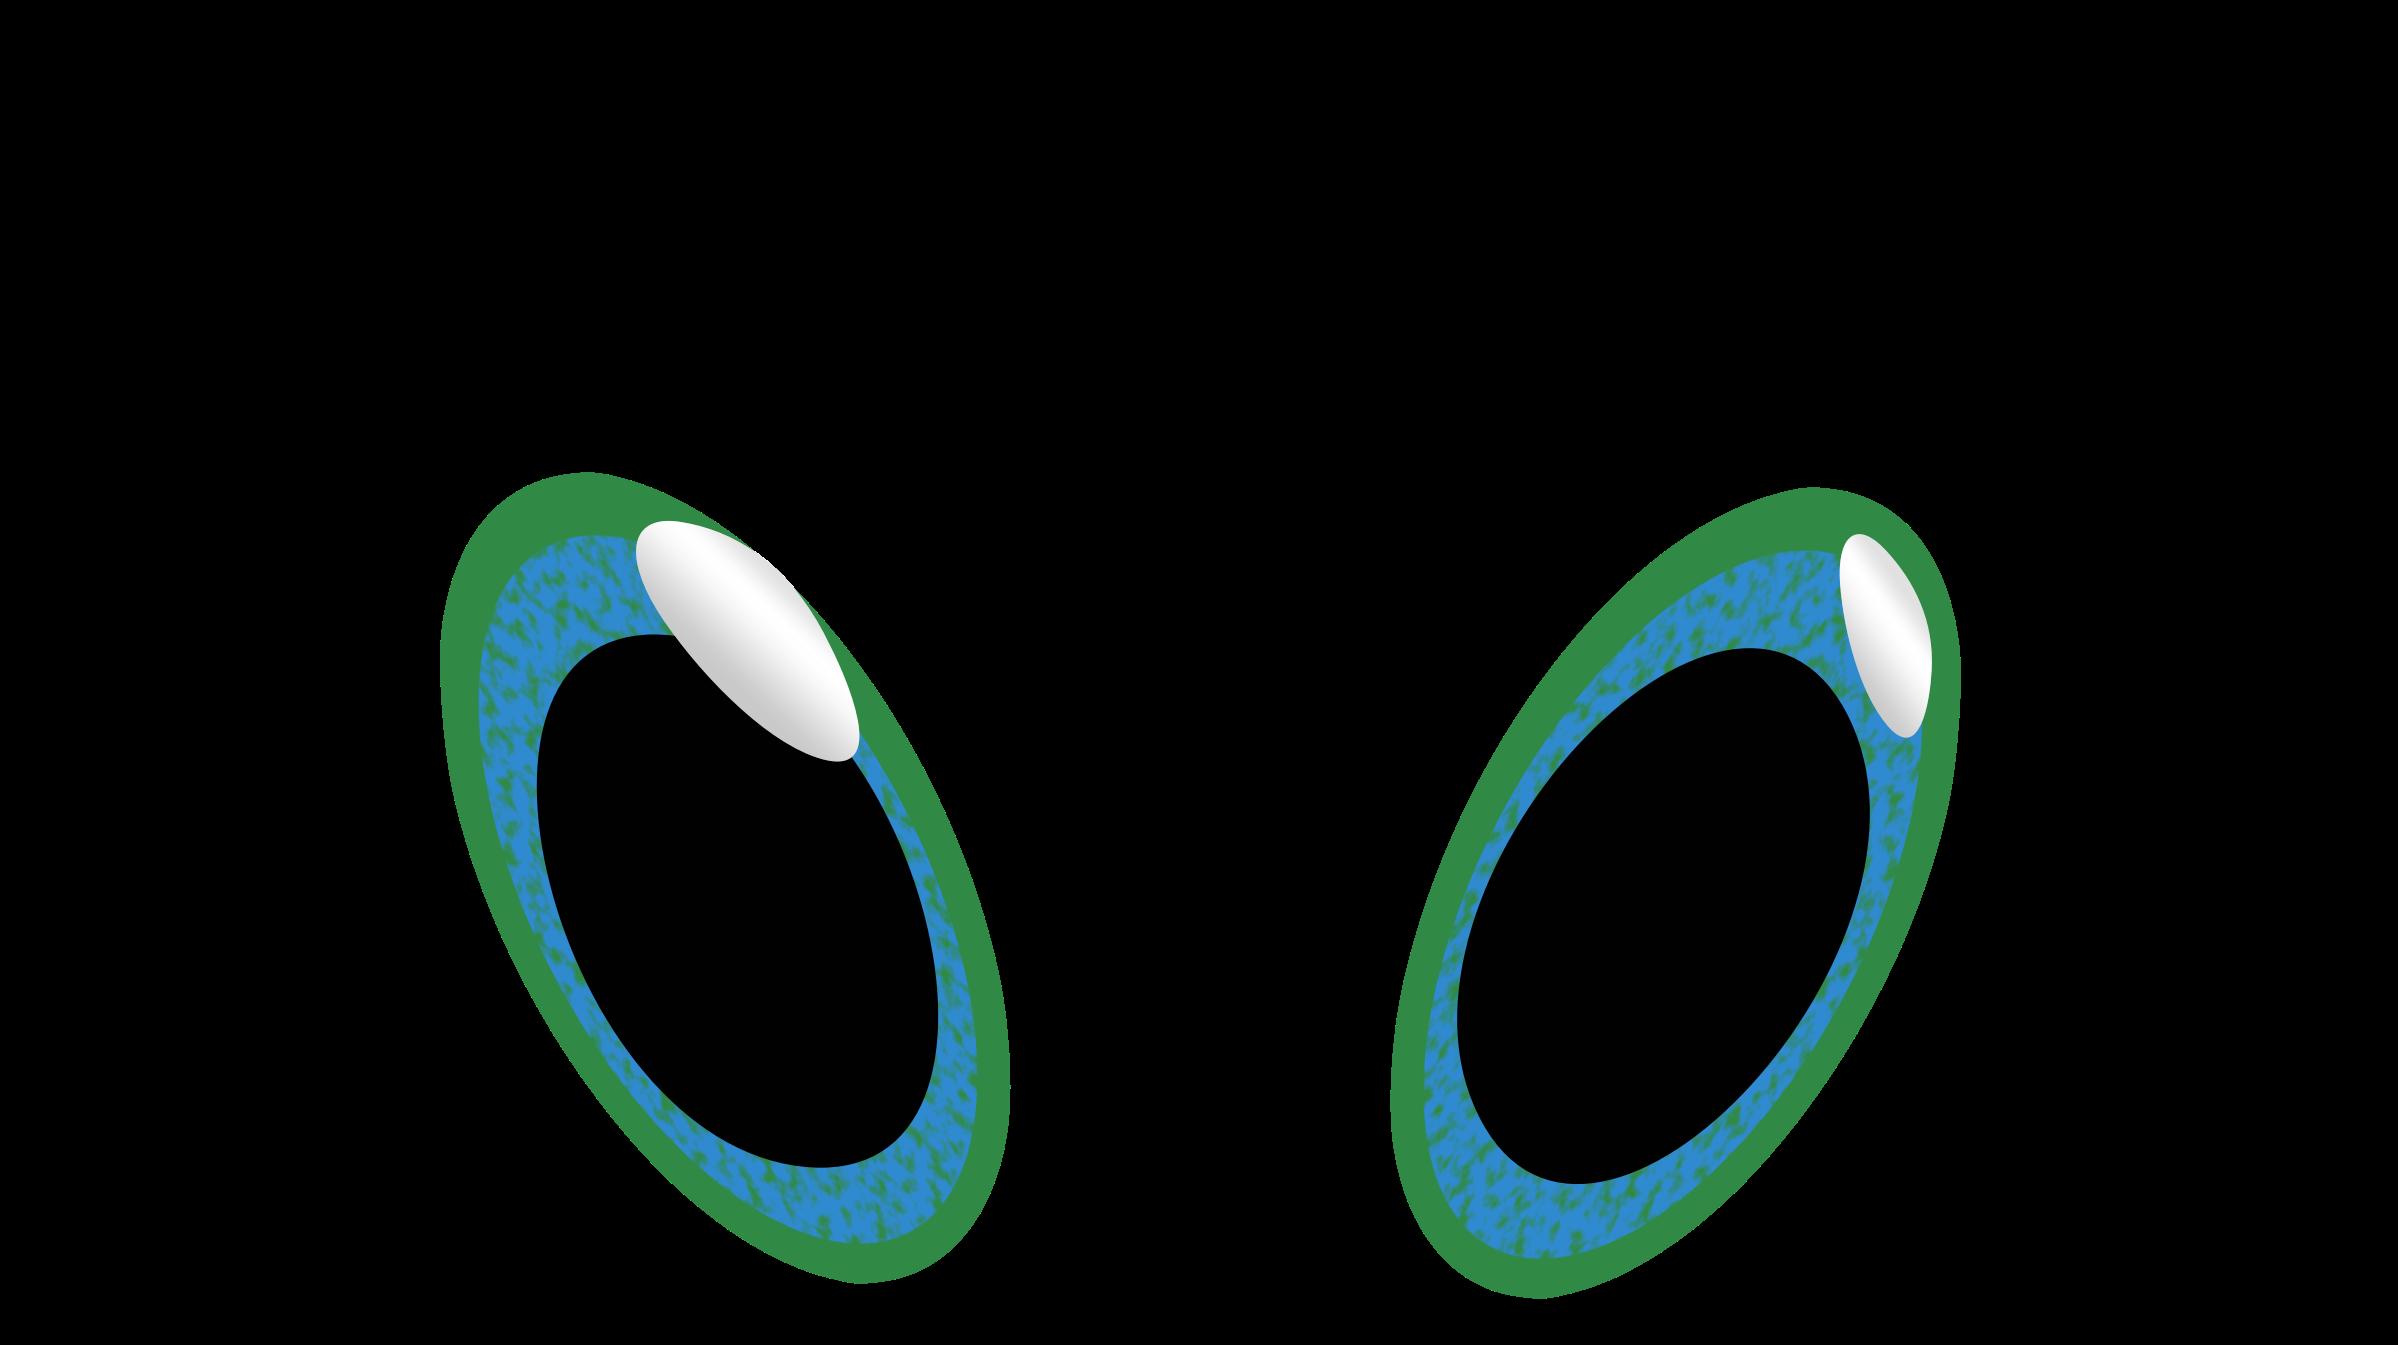 Eyeball clipart frog eye Cliparts Clipart Fun Zone Eyes